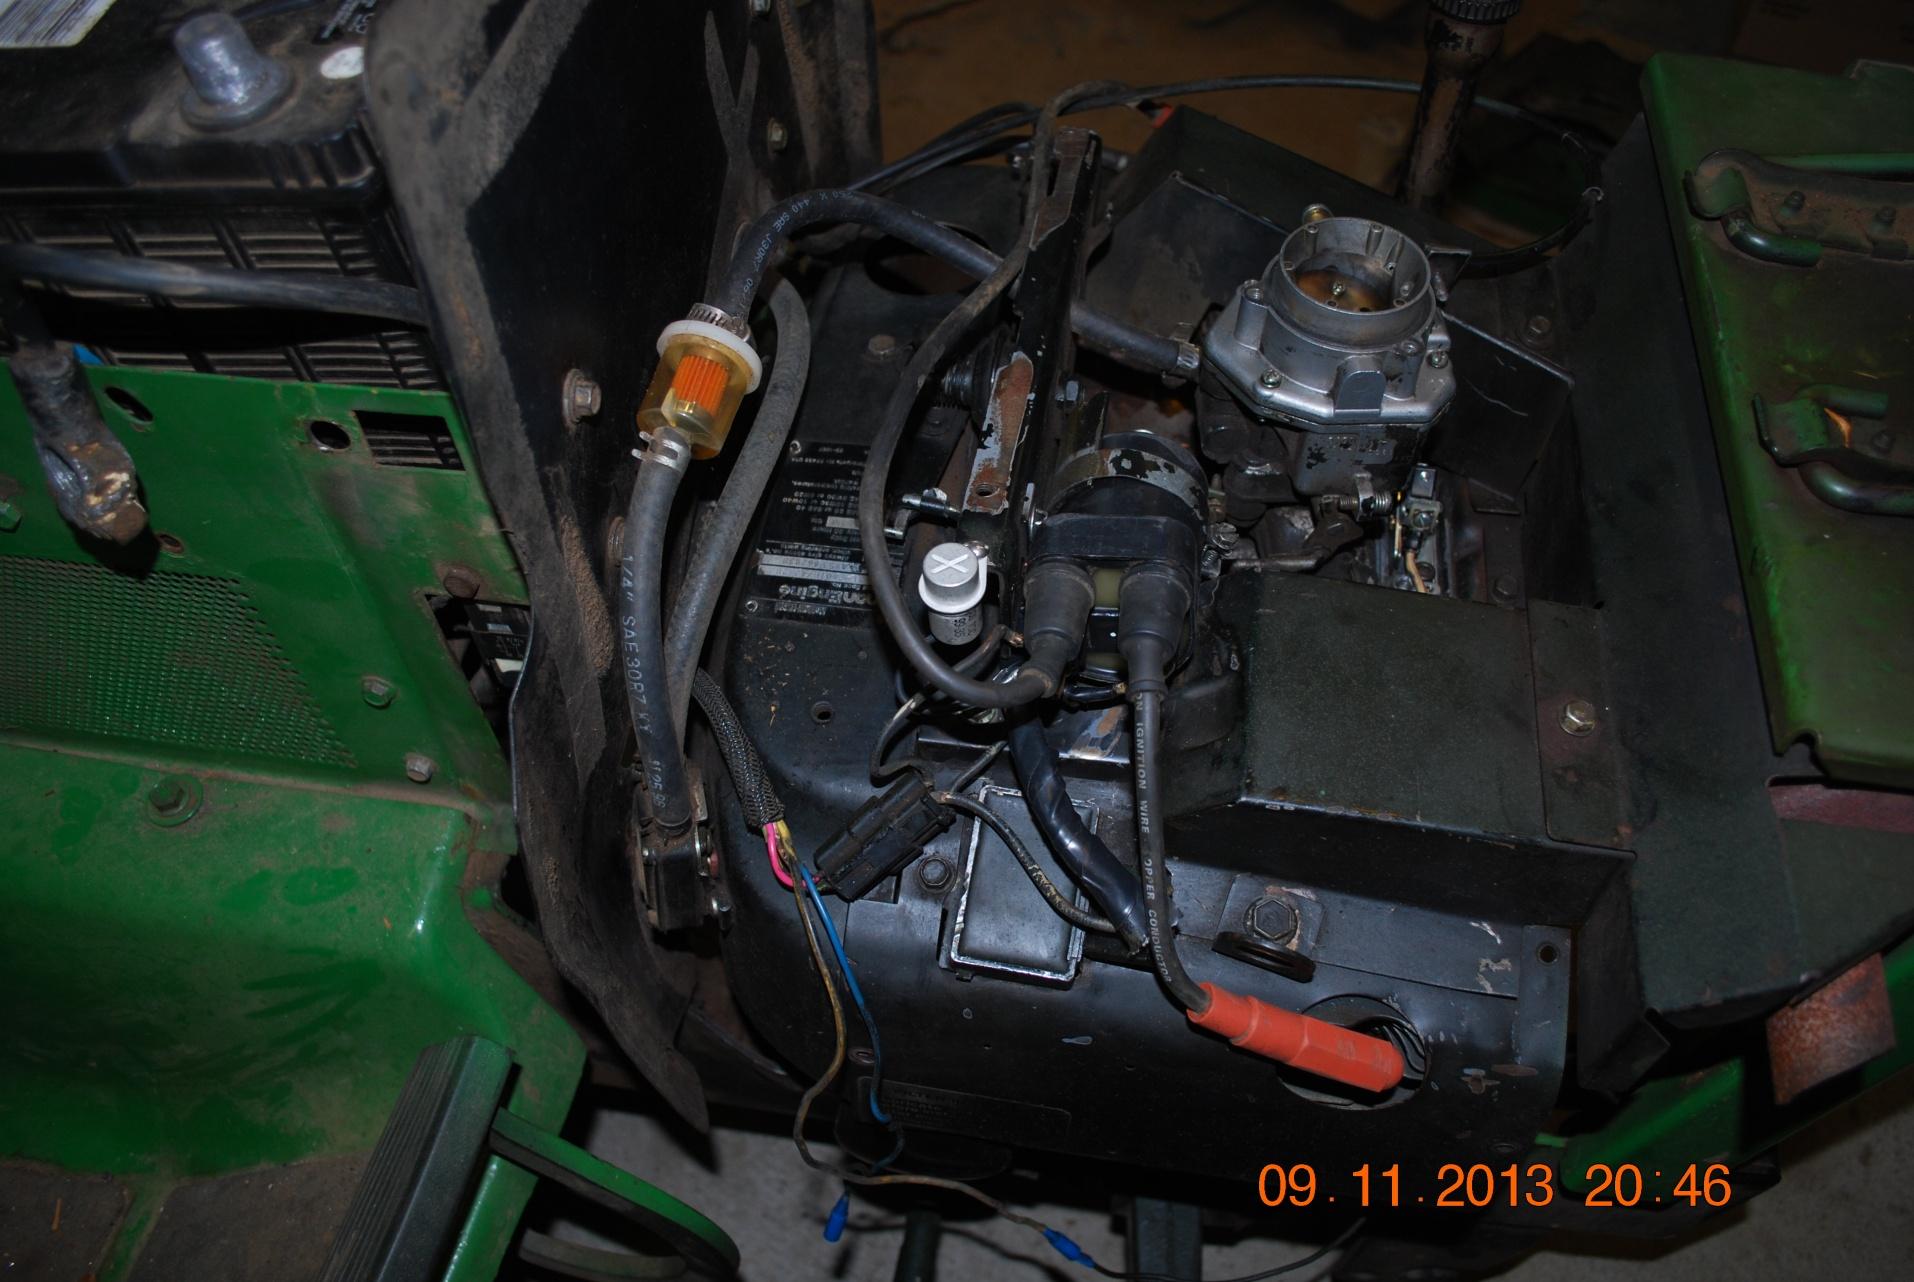 wiring diagram john deere 316 wiring diagrams and schematics john deere 345 wiring diagram diagrams and schematics